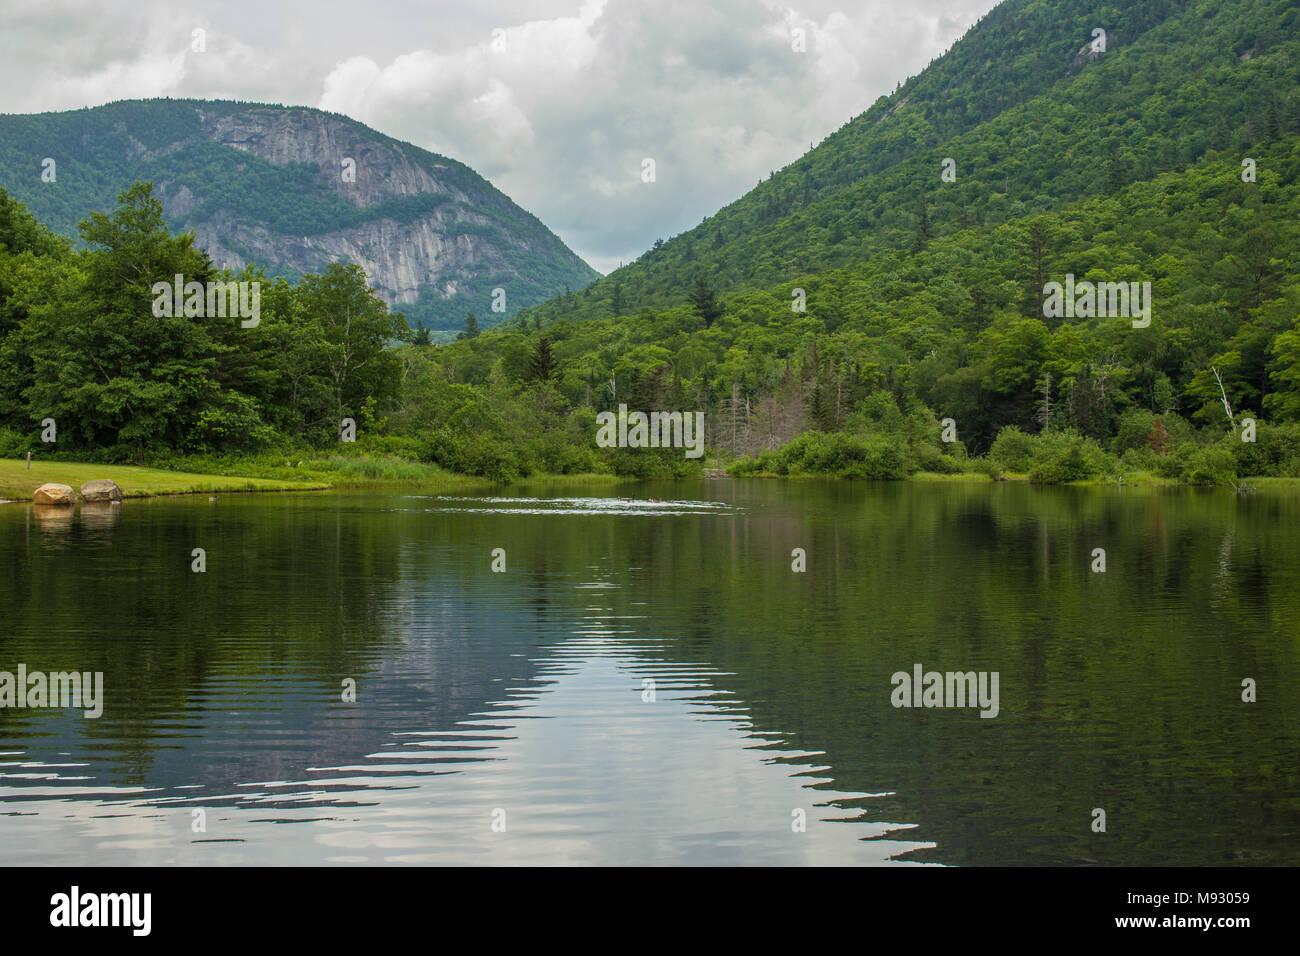 V Pattern of White Mtns on Wiley Pond. Hart's Location, NH, Roads, Willey Pond, Mountain Notch, Tourism, Shorelines, V Shape, Rock slide, W.M. Notch Stock Photo